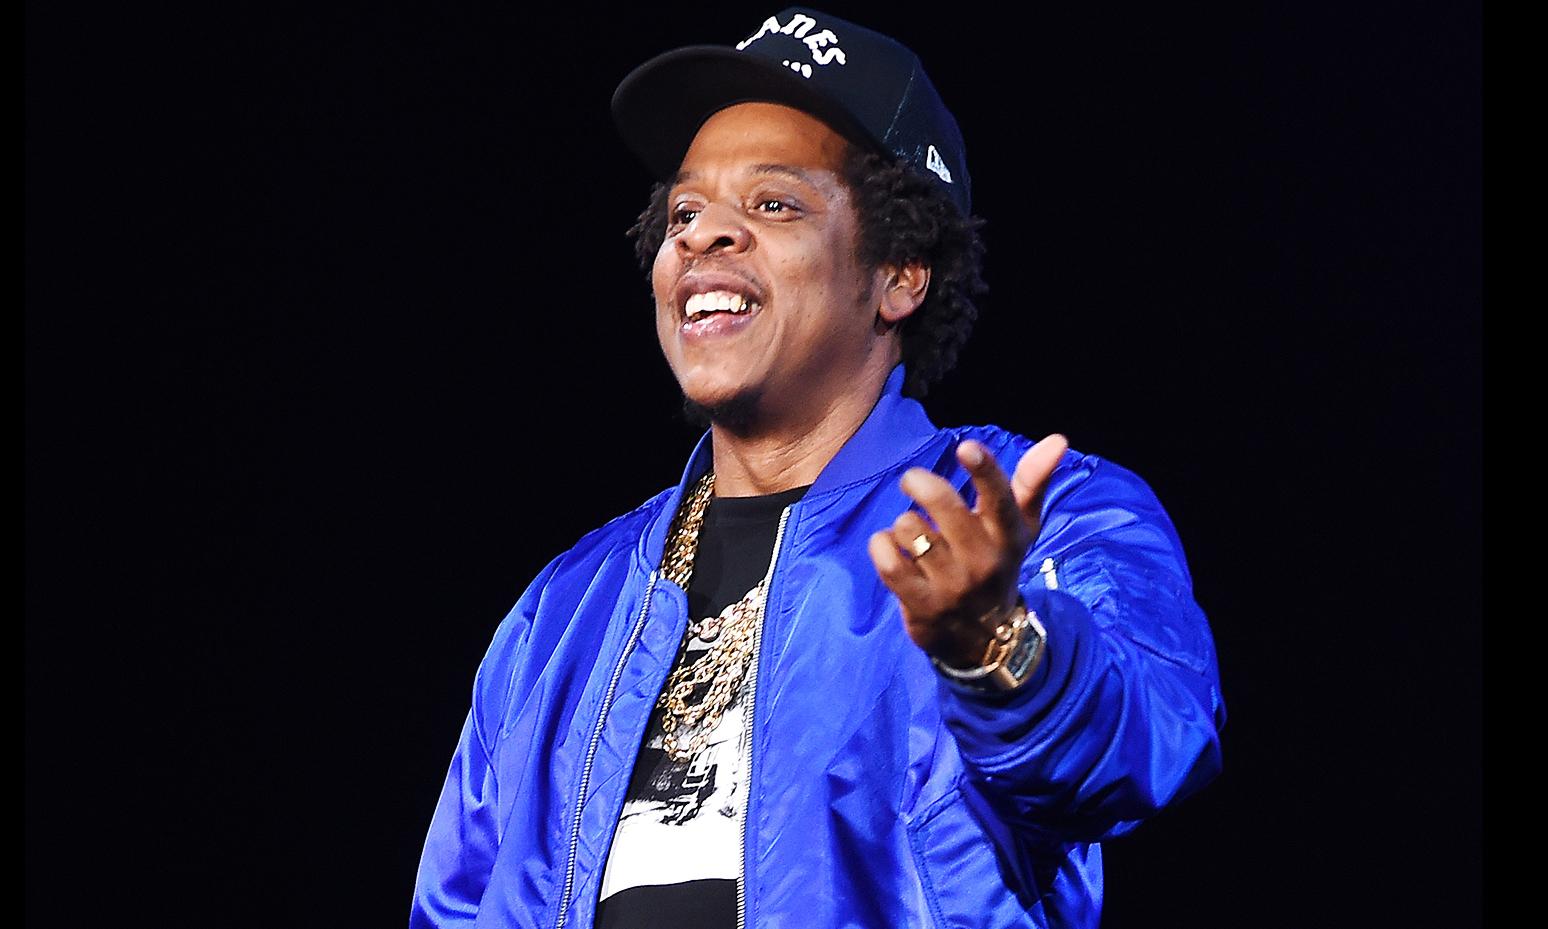 Jay-Z 正式成为史上第一个财富 10 亿美元级说唱歌手